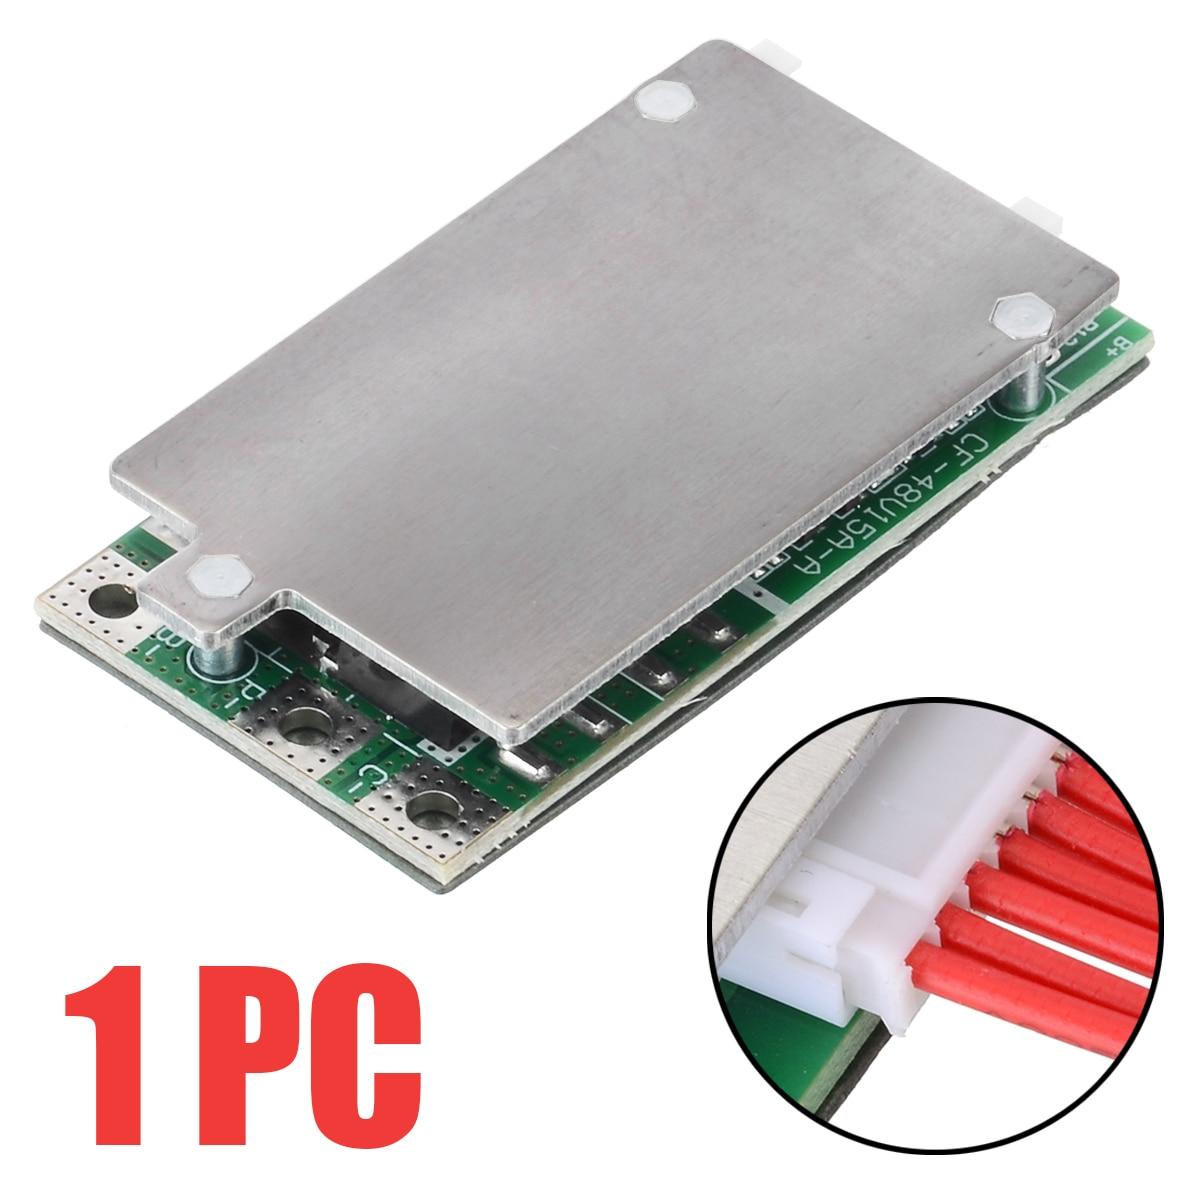 1 шт. Высокое качество литиевая батарея защита питания плата 10S 36V 37V 15A литий-ионный аккумулятор BMS PCB PCM Mayitr